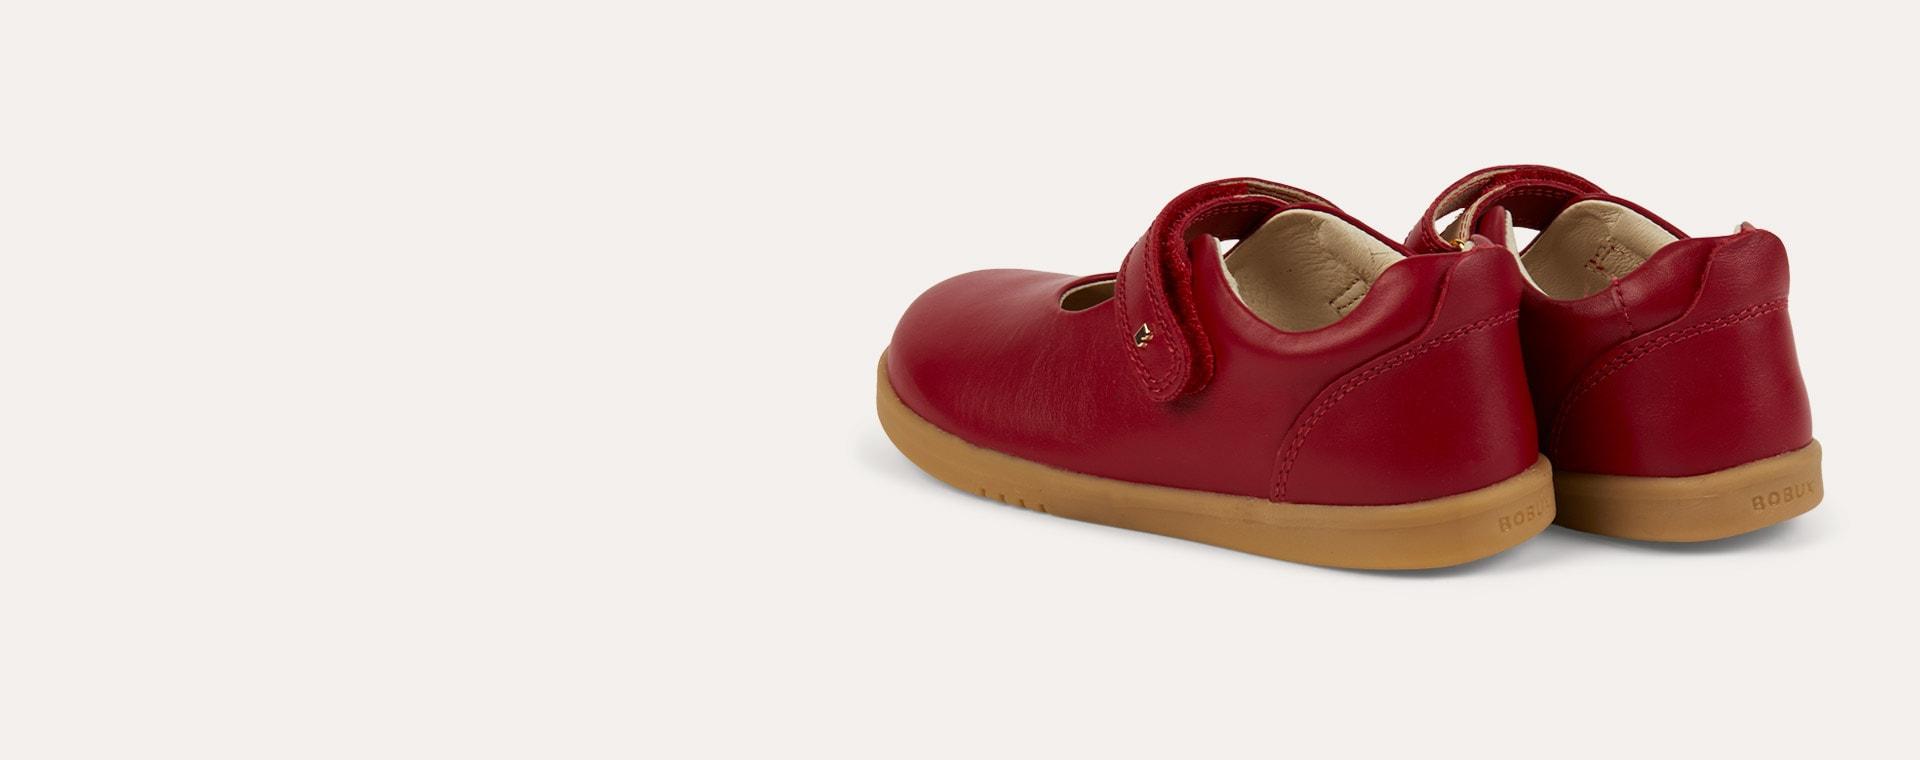 Rio Red Bobux Kid+ Delight Mary Jane Shoe